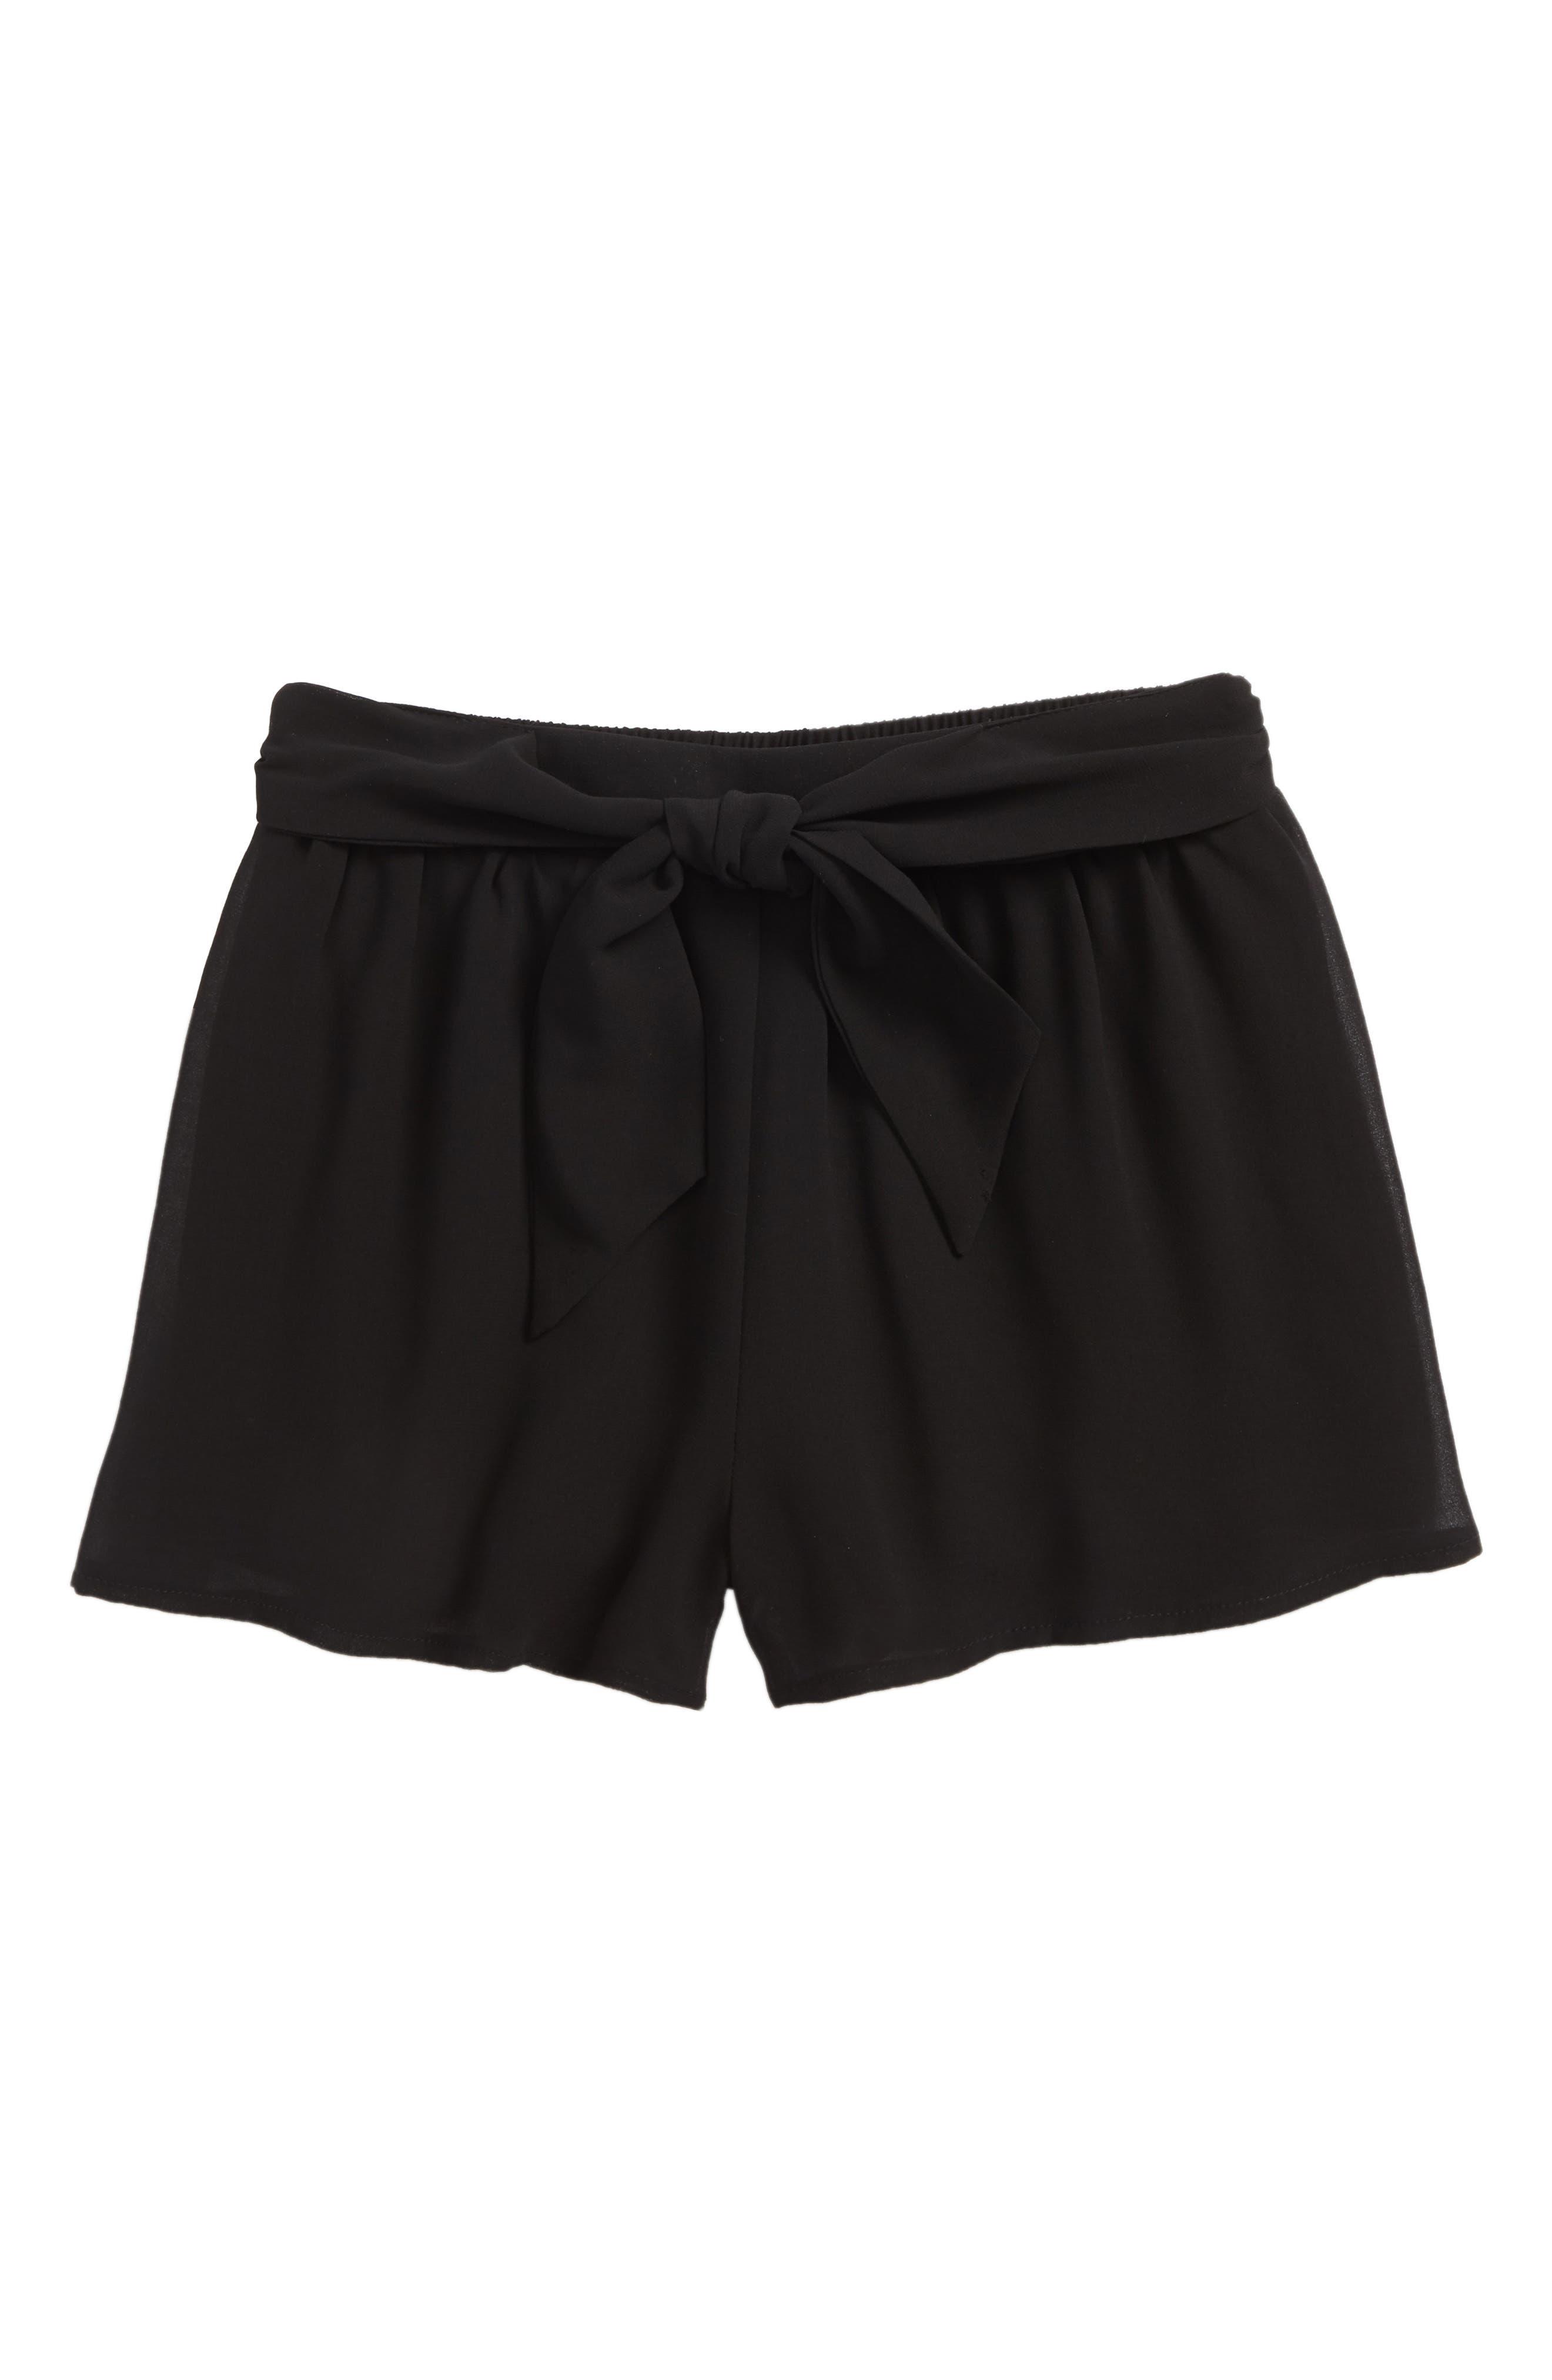 Bridget Shorts,                             Main thumbnail 1, color,                             Black